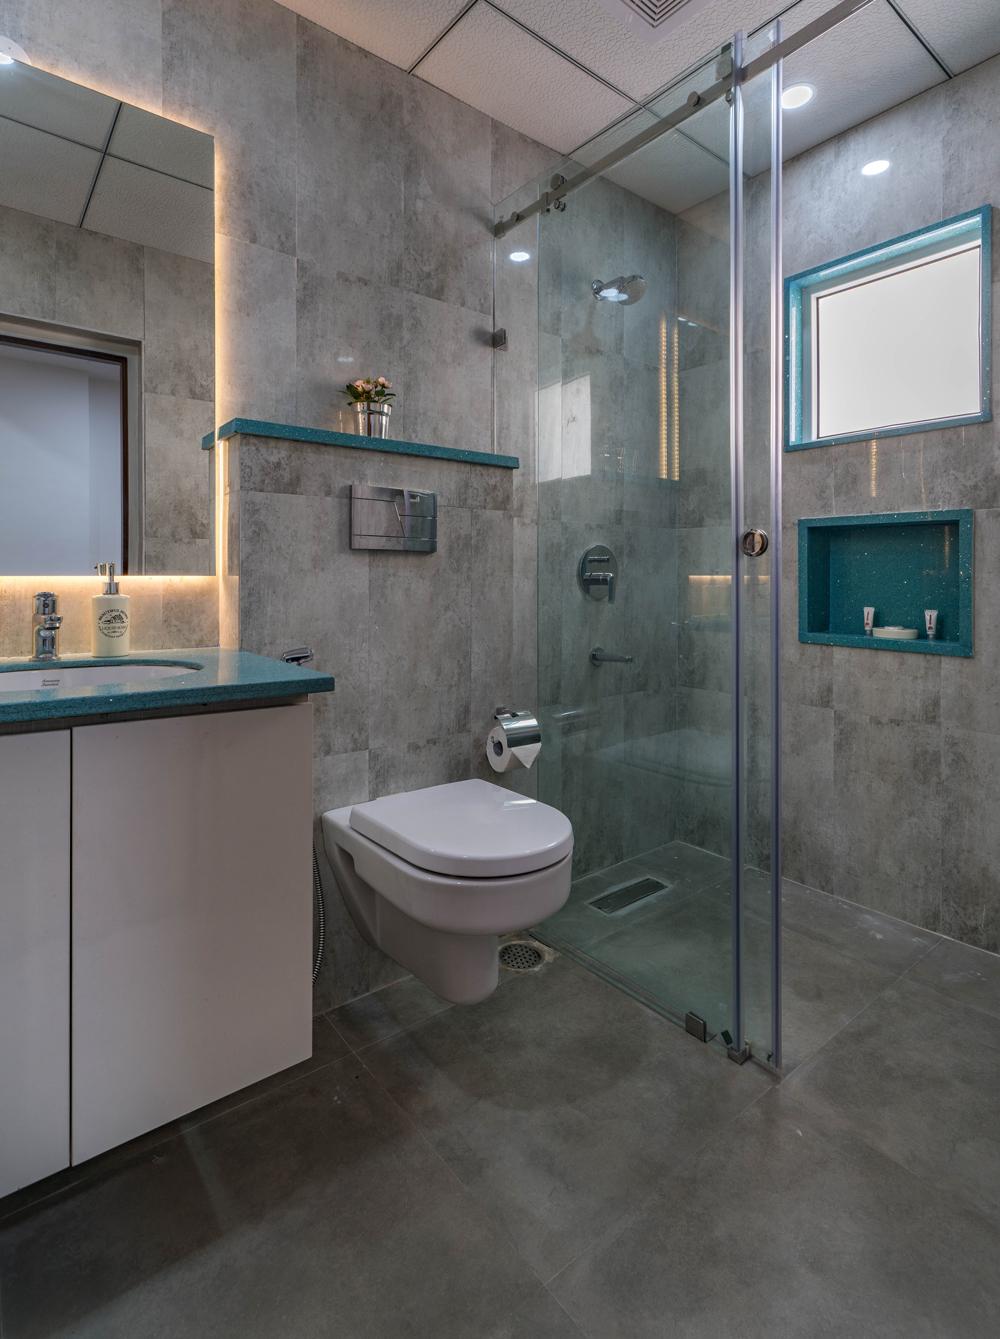 skyla-serviced-suites-kitchen8.jpg